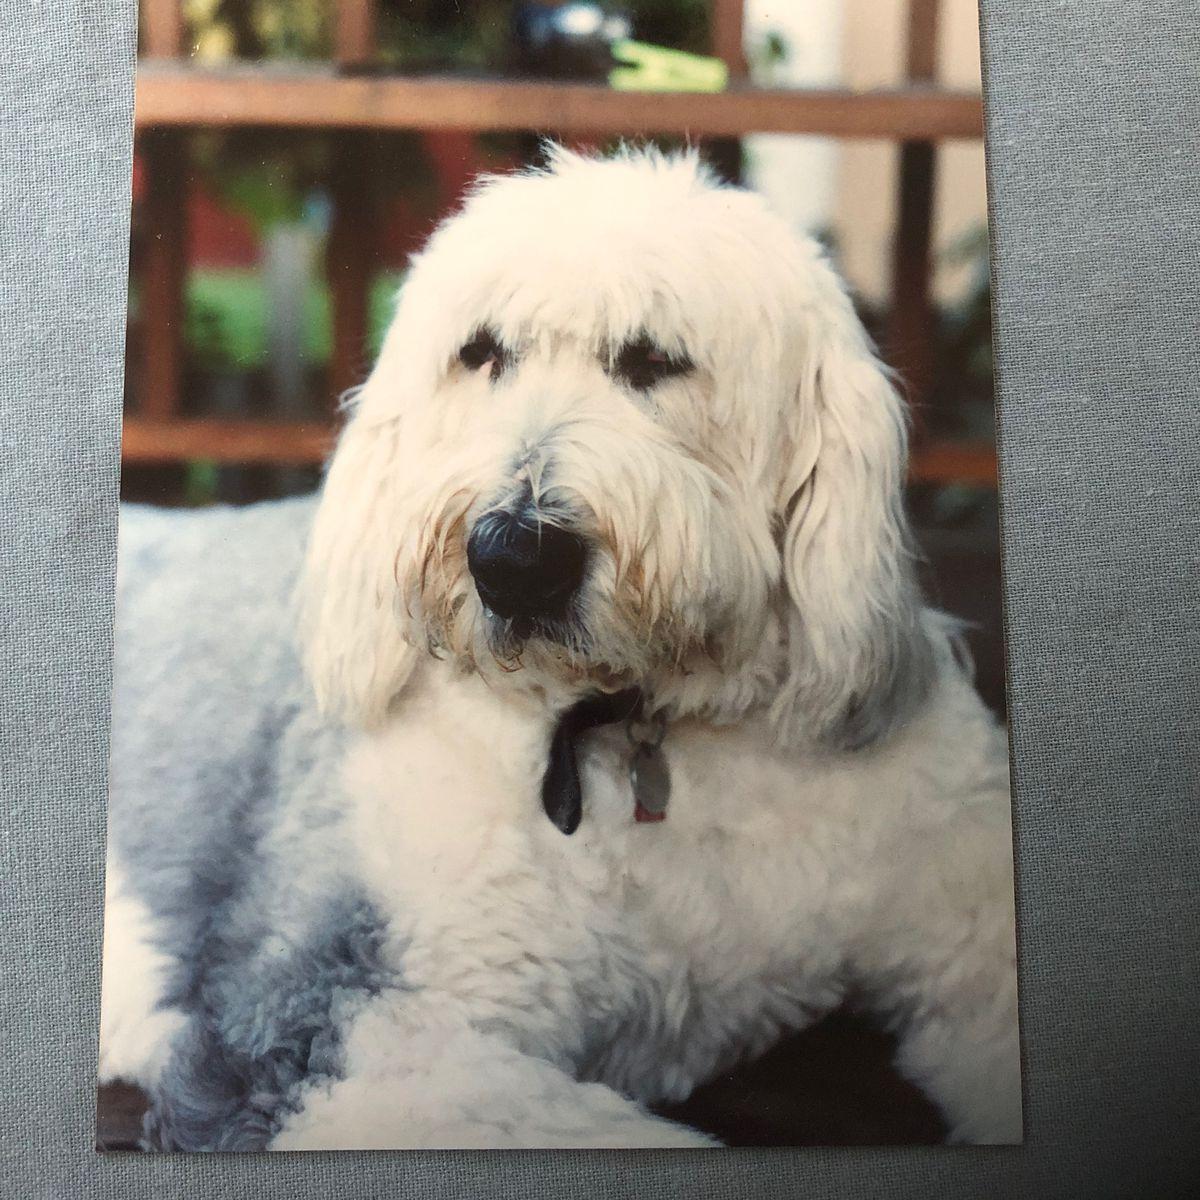 Mr. Digby, Mr. Digby's dog